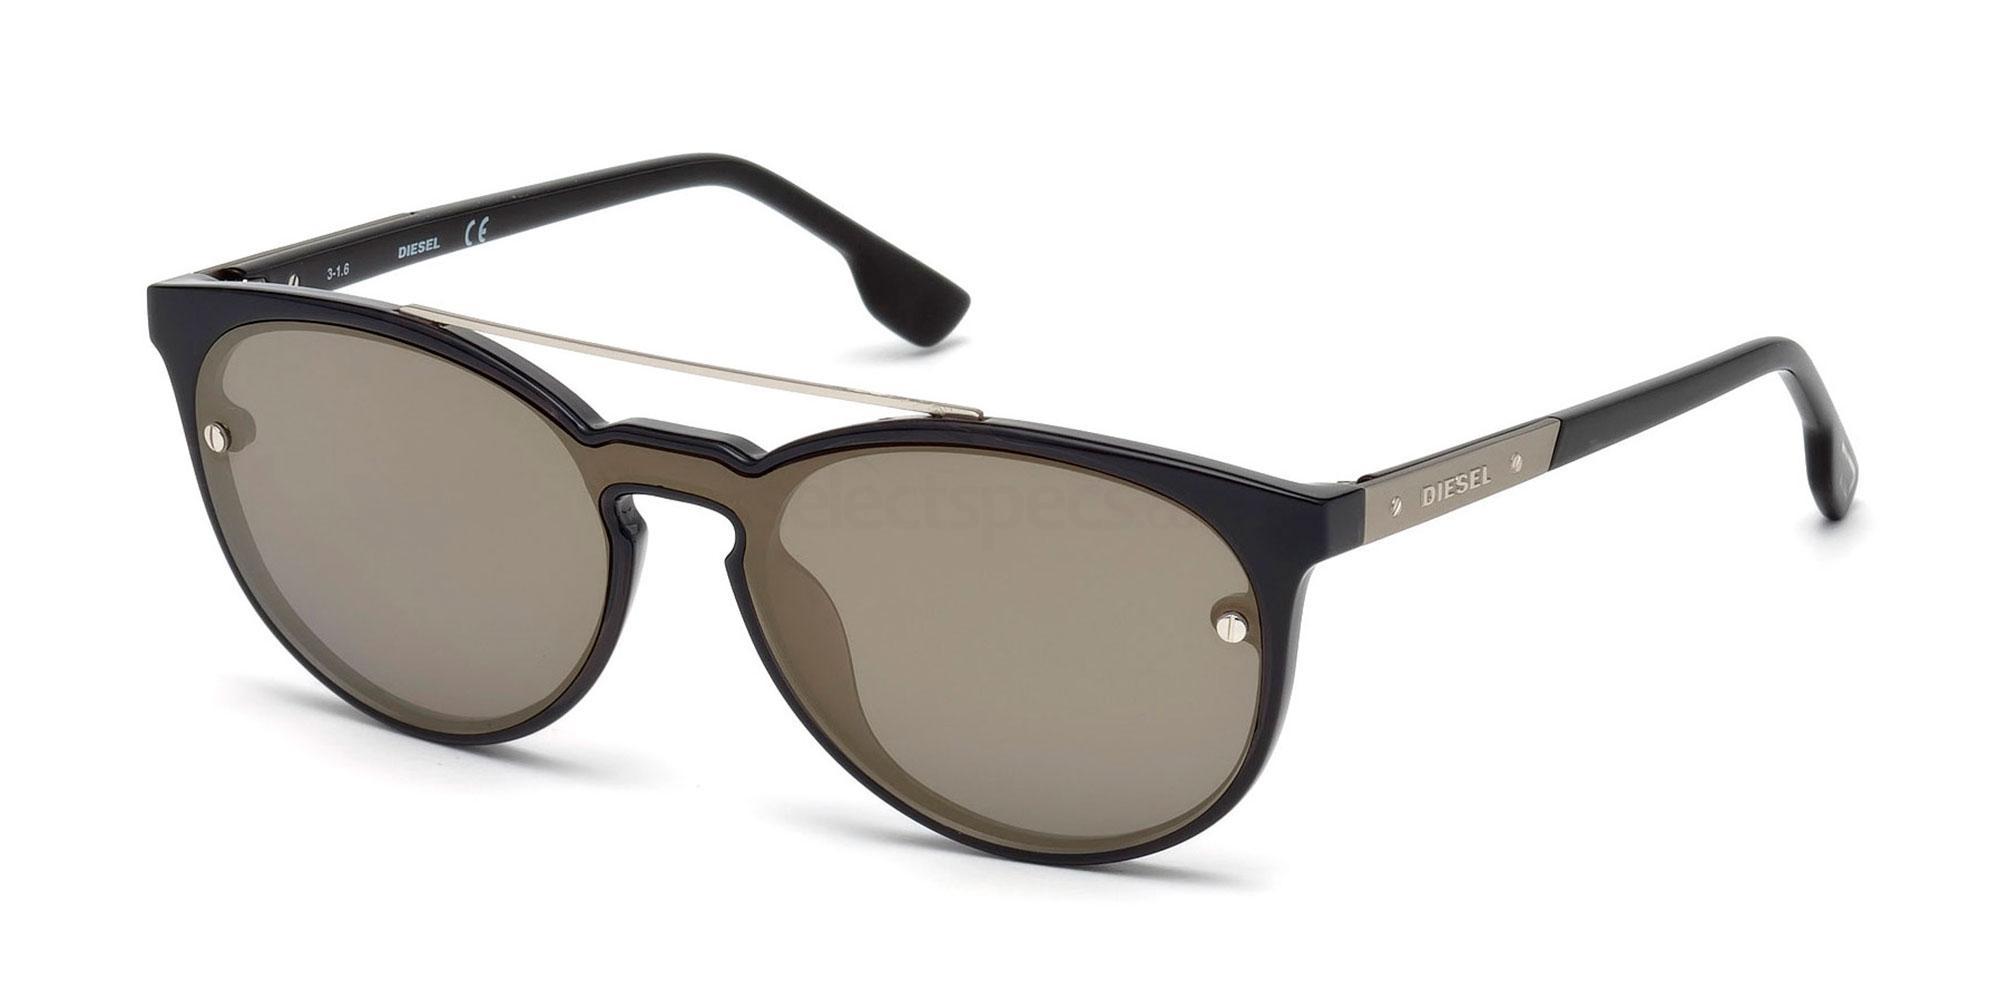 20C DL0216 Sunglasses, Diesel